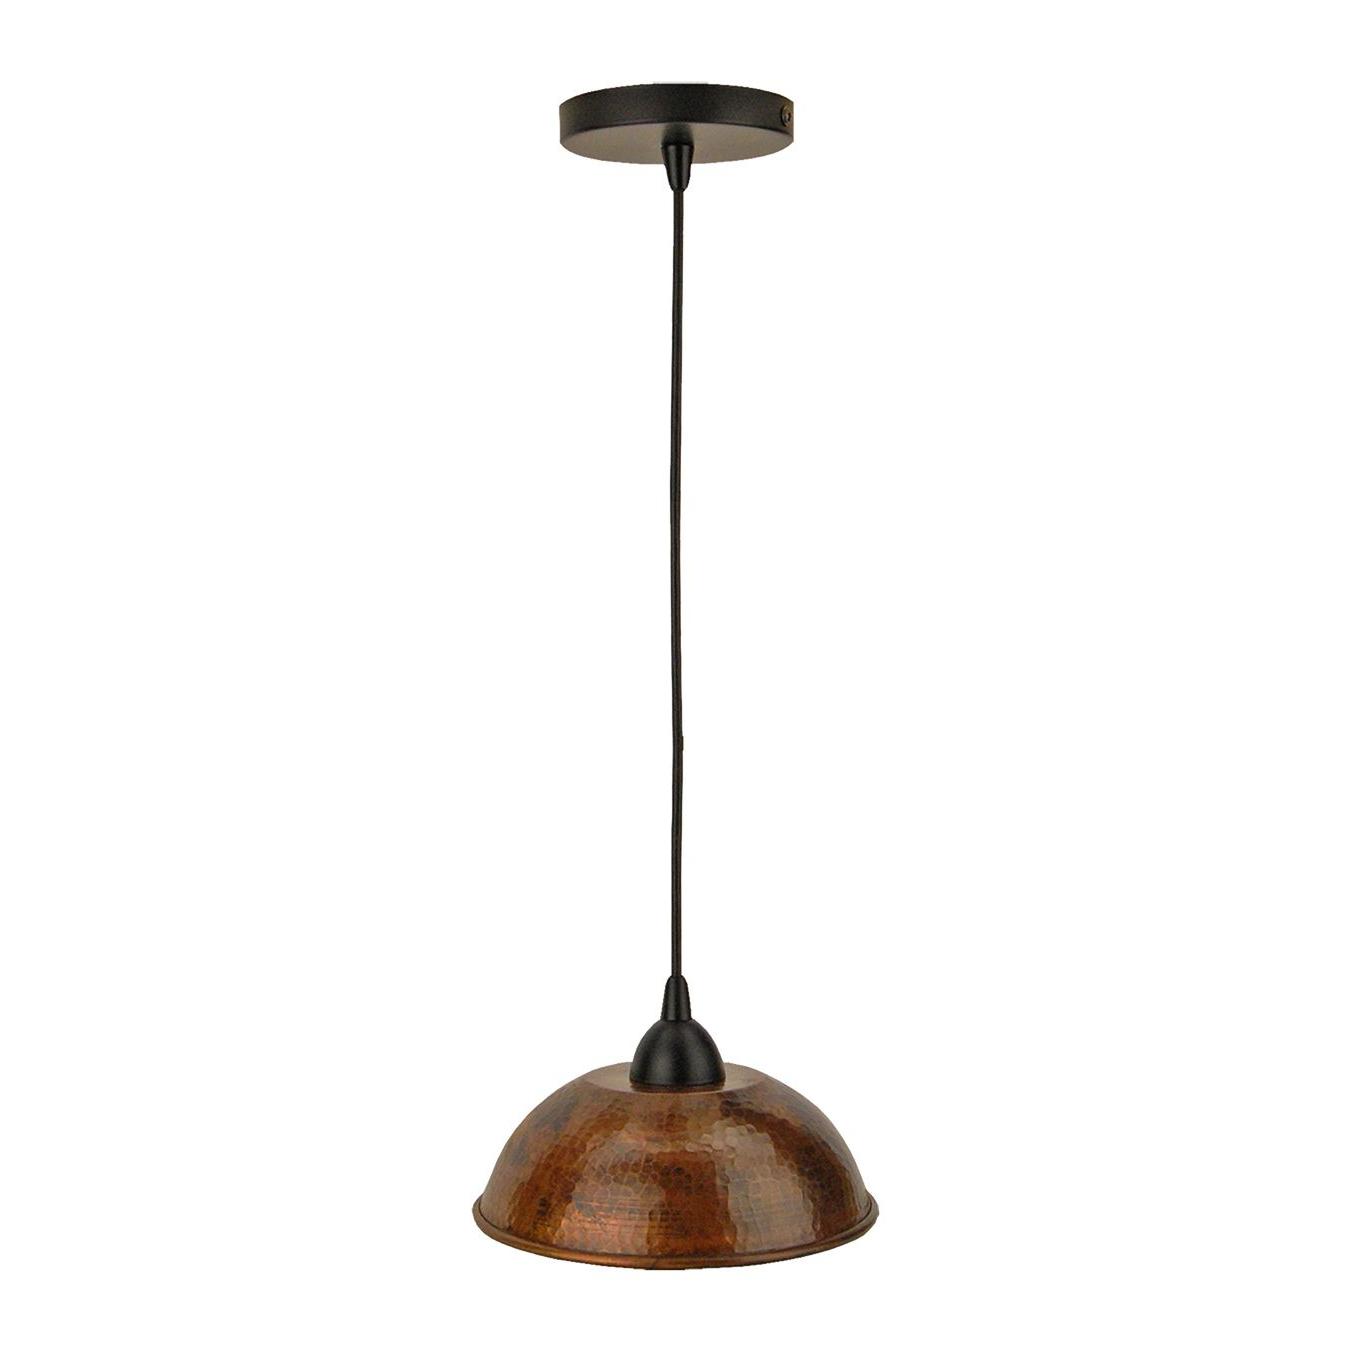 Bellamira 1-Light Drum Pendants intended for Recent Premier Copper Products 10.5-In Copper Dome Pendant Light